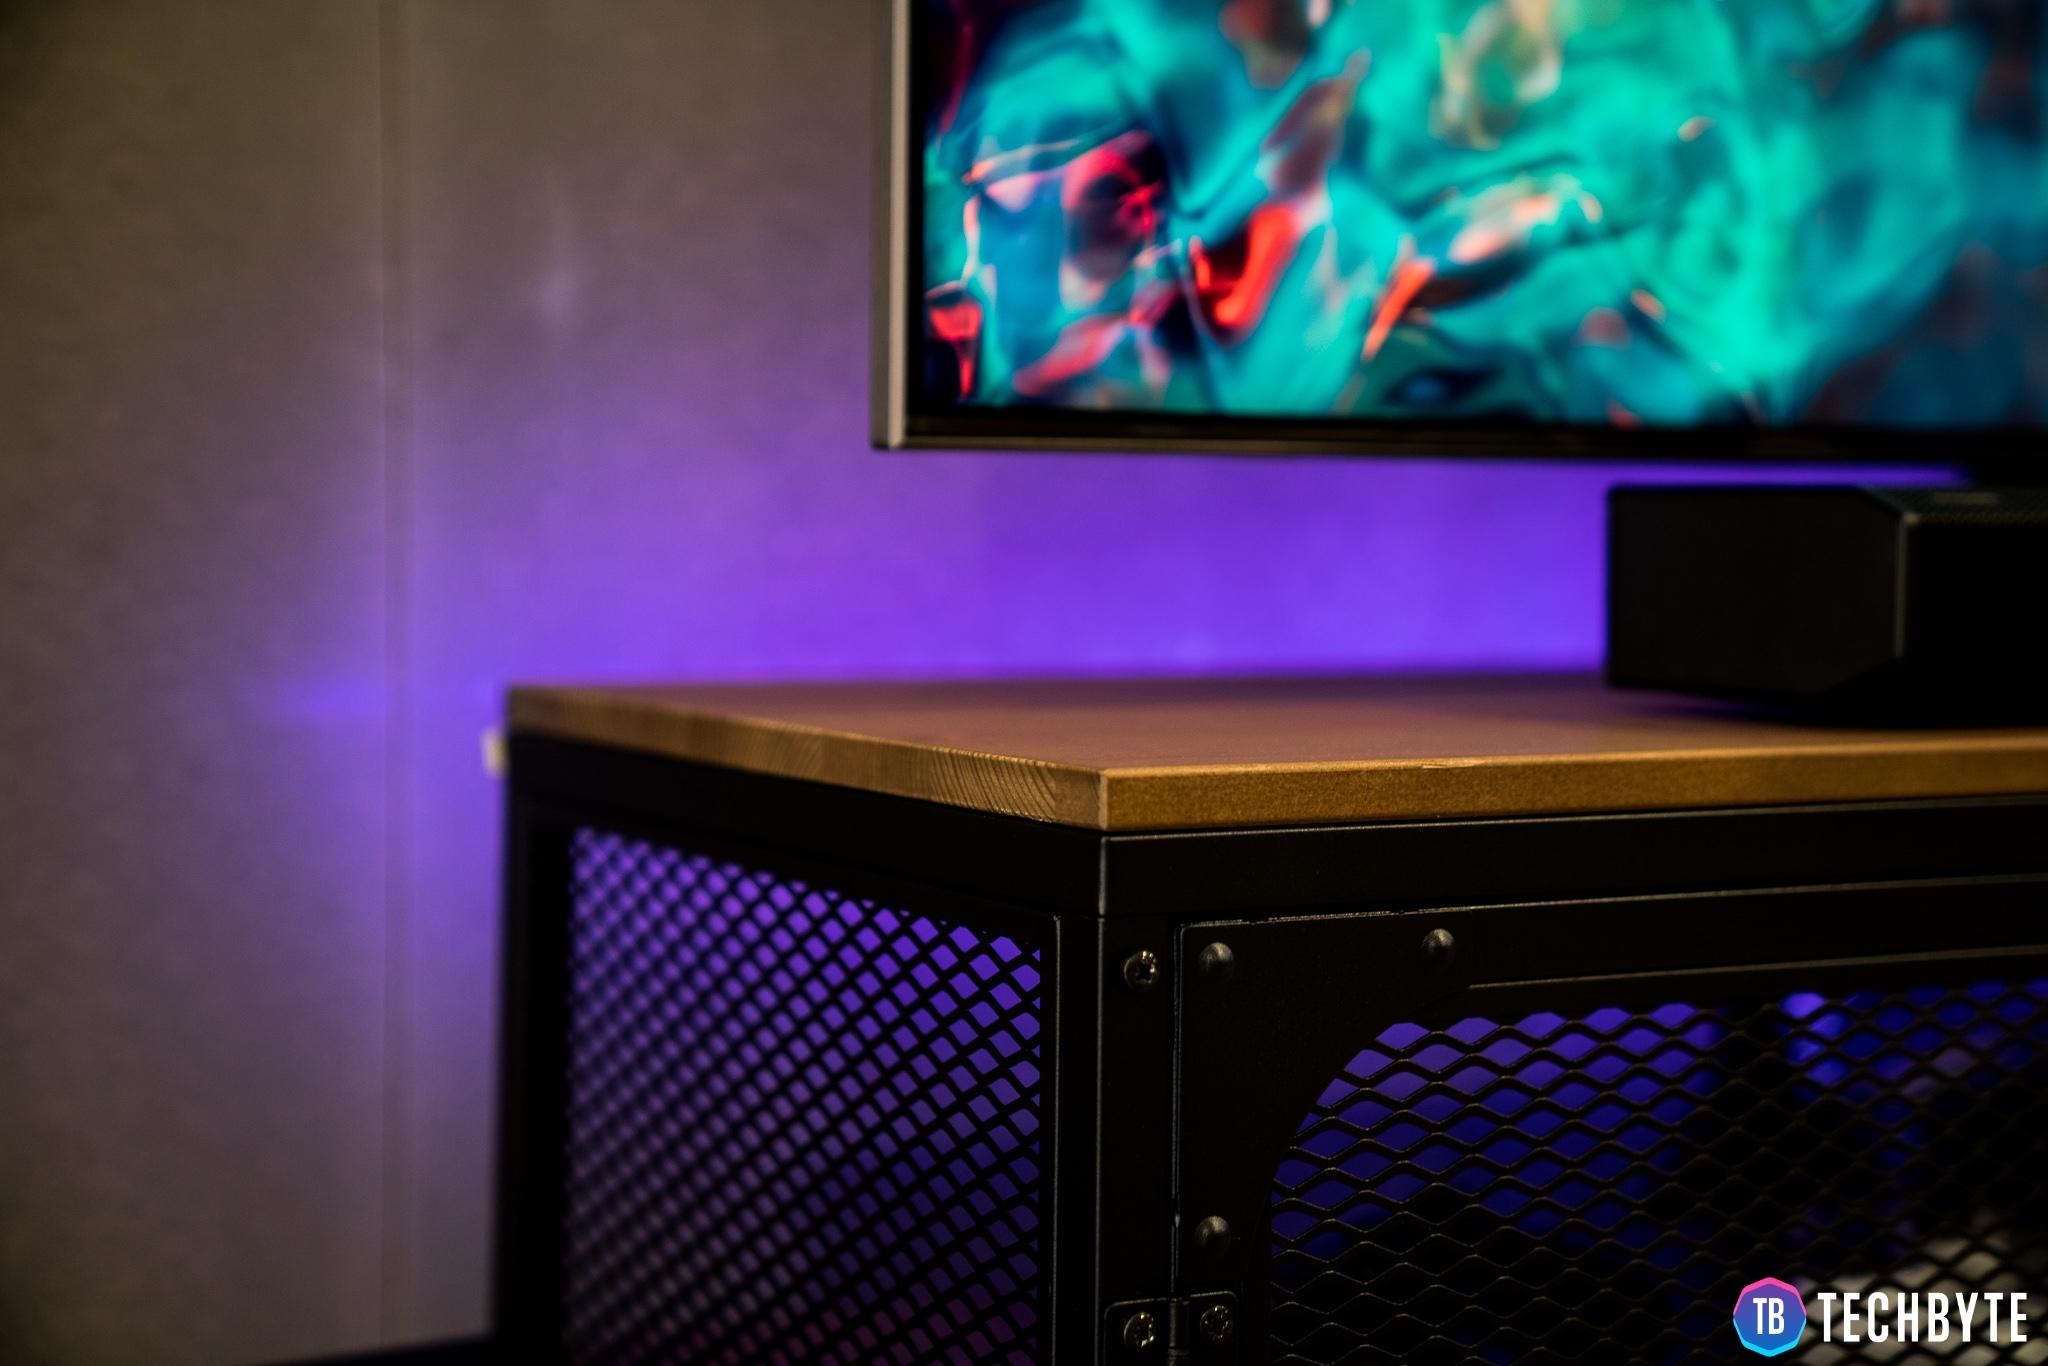 Lidl Smart Home: LED svetelný pás